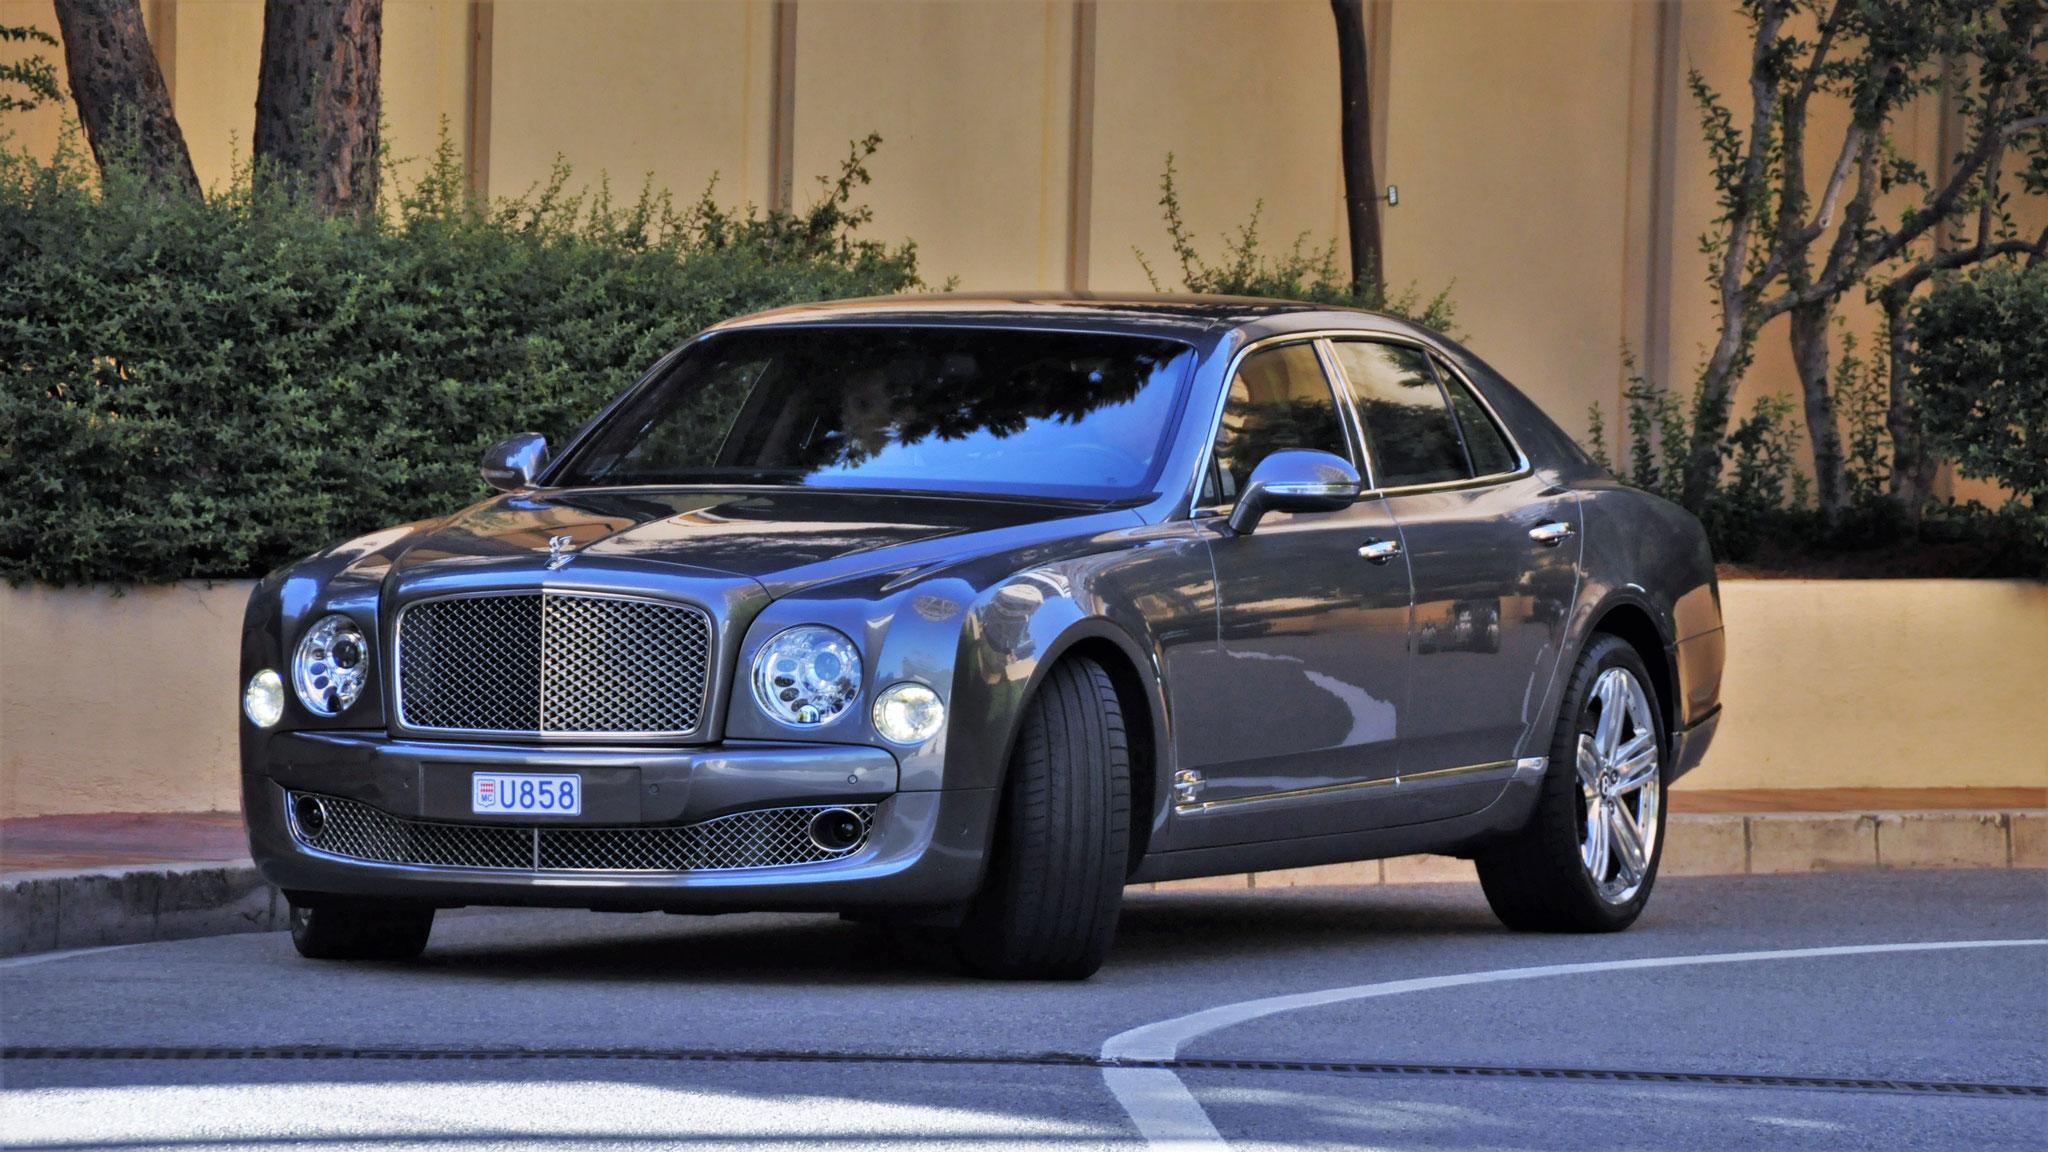 Bentley Mulsanne - U858 (MC)